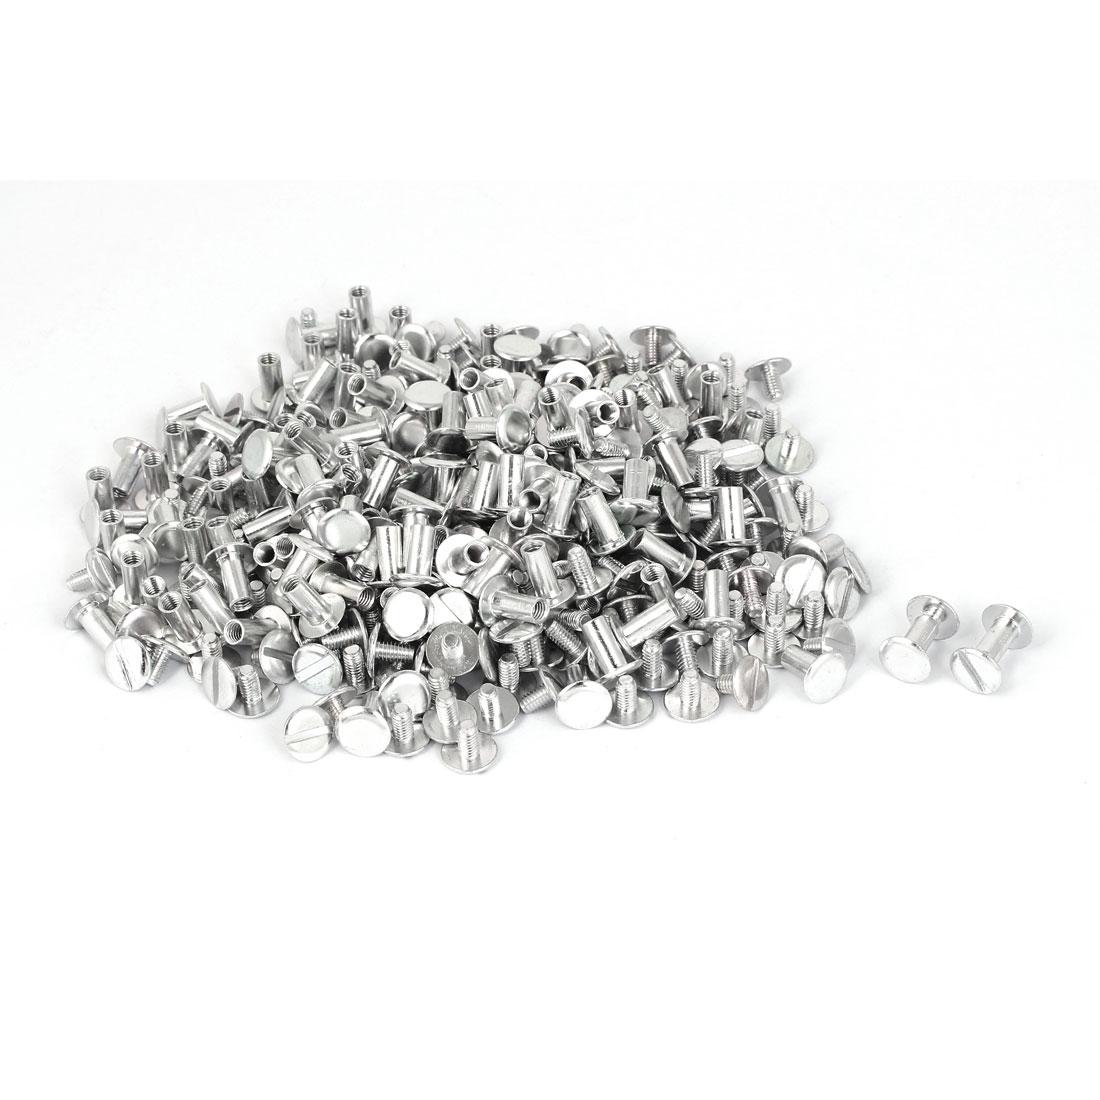 M5x10mm Aluminum Chicago Screws Binding Posts Silver Tone 200pcs